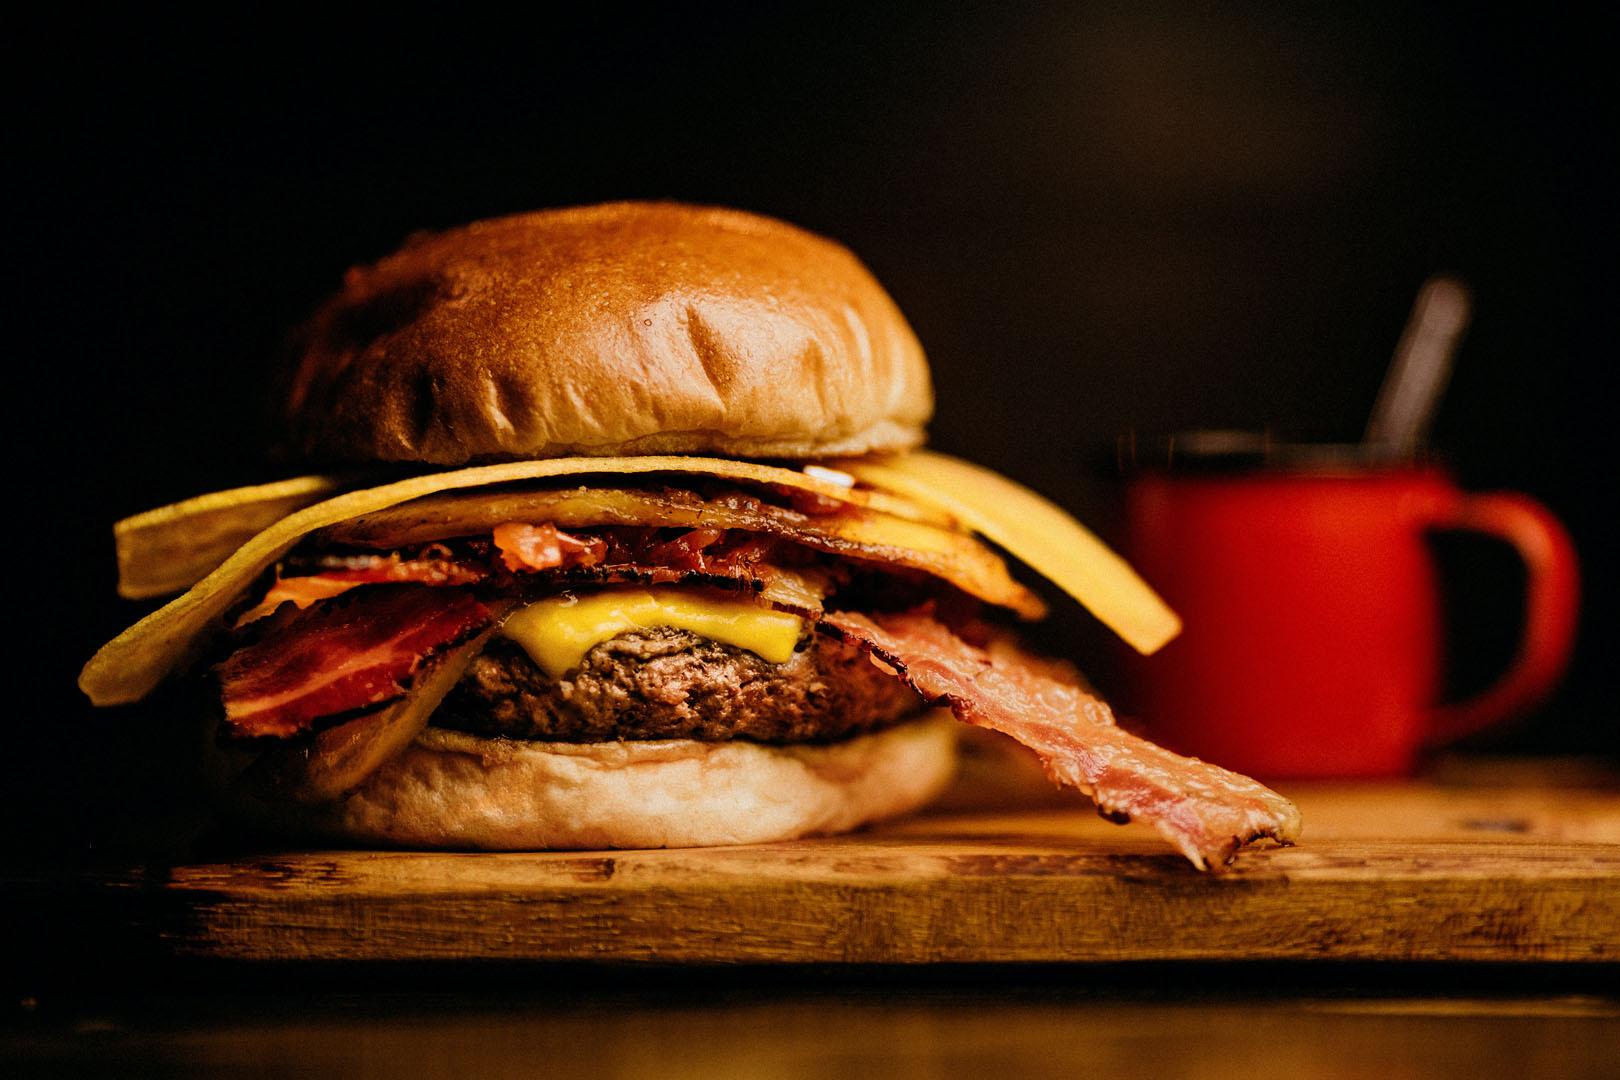 ham-and-bacon-burger-2983098.jpg